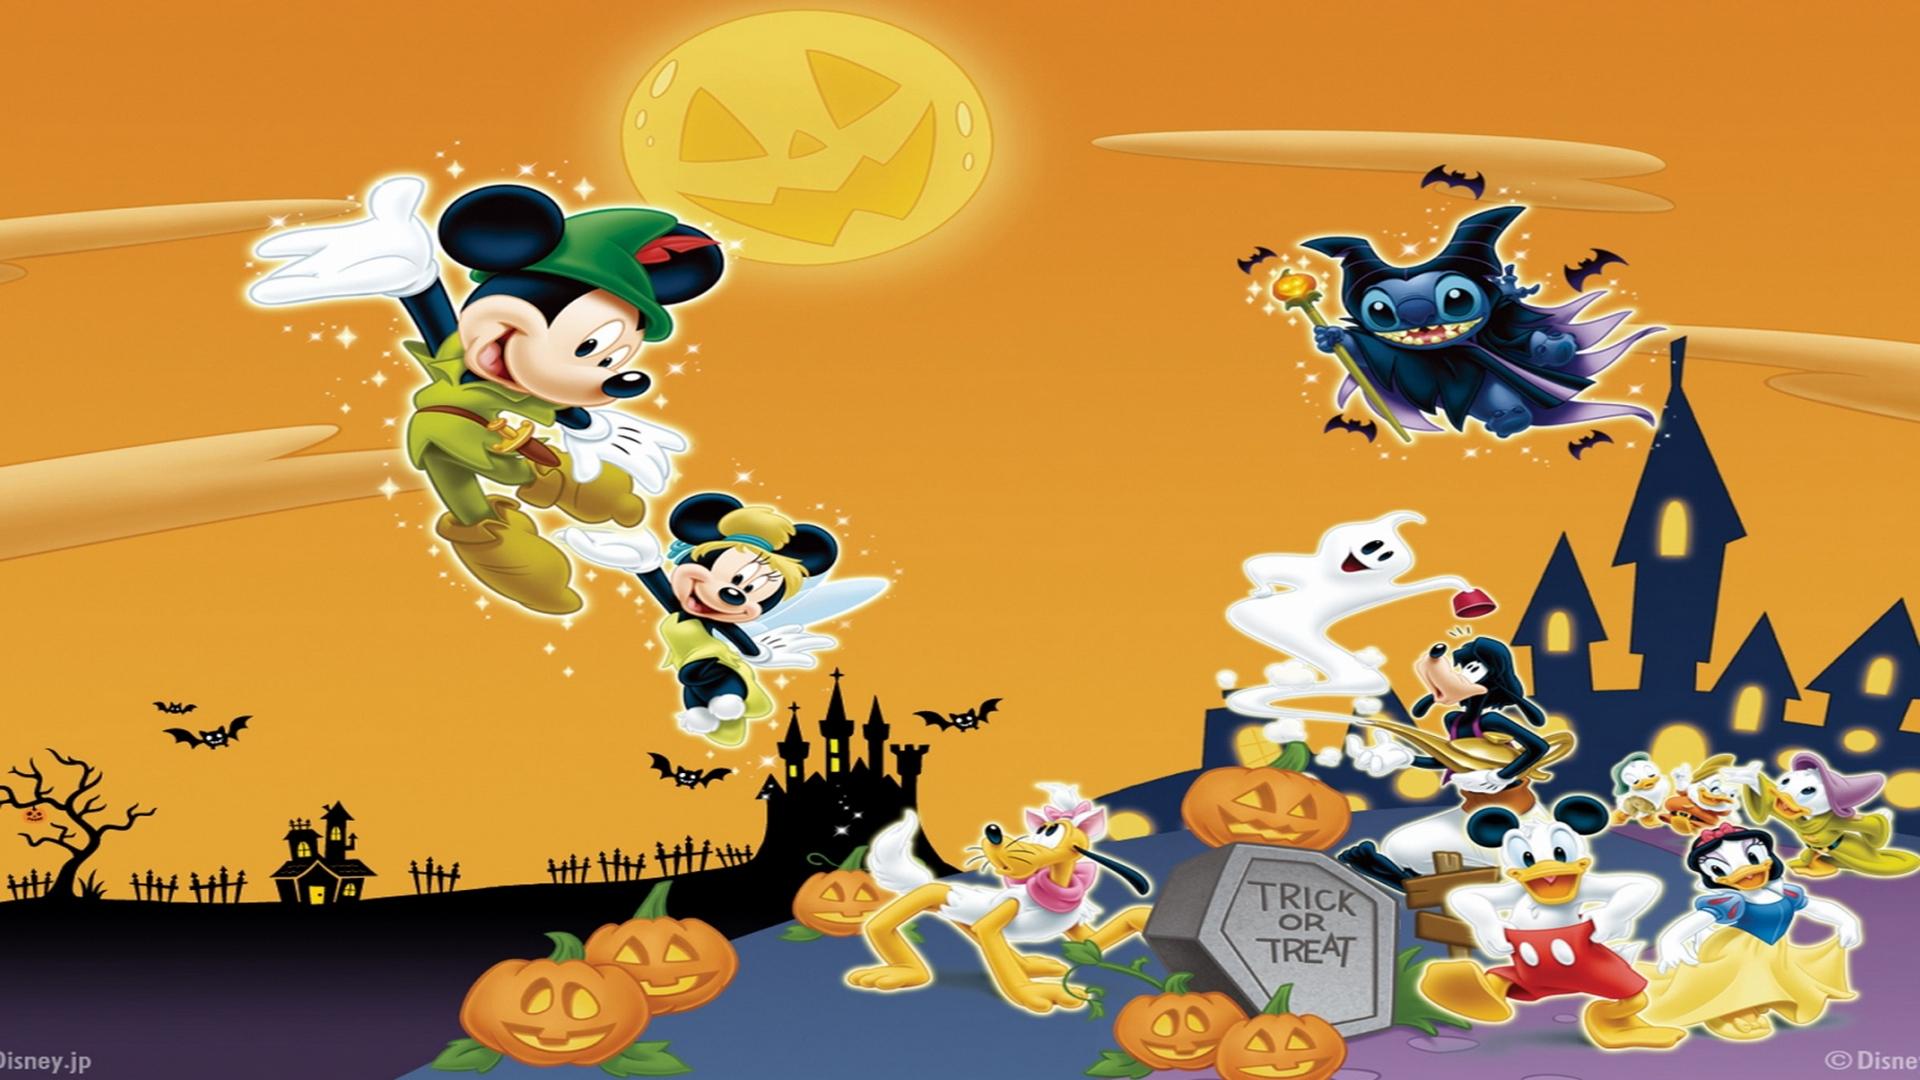 Fall Daisy Wallpaper Disney Halloween Wallpapers Hd Pixelstalk Net